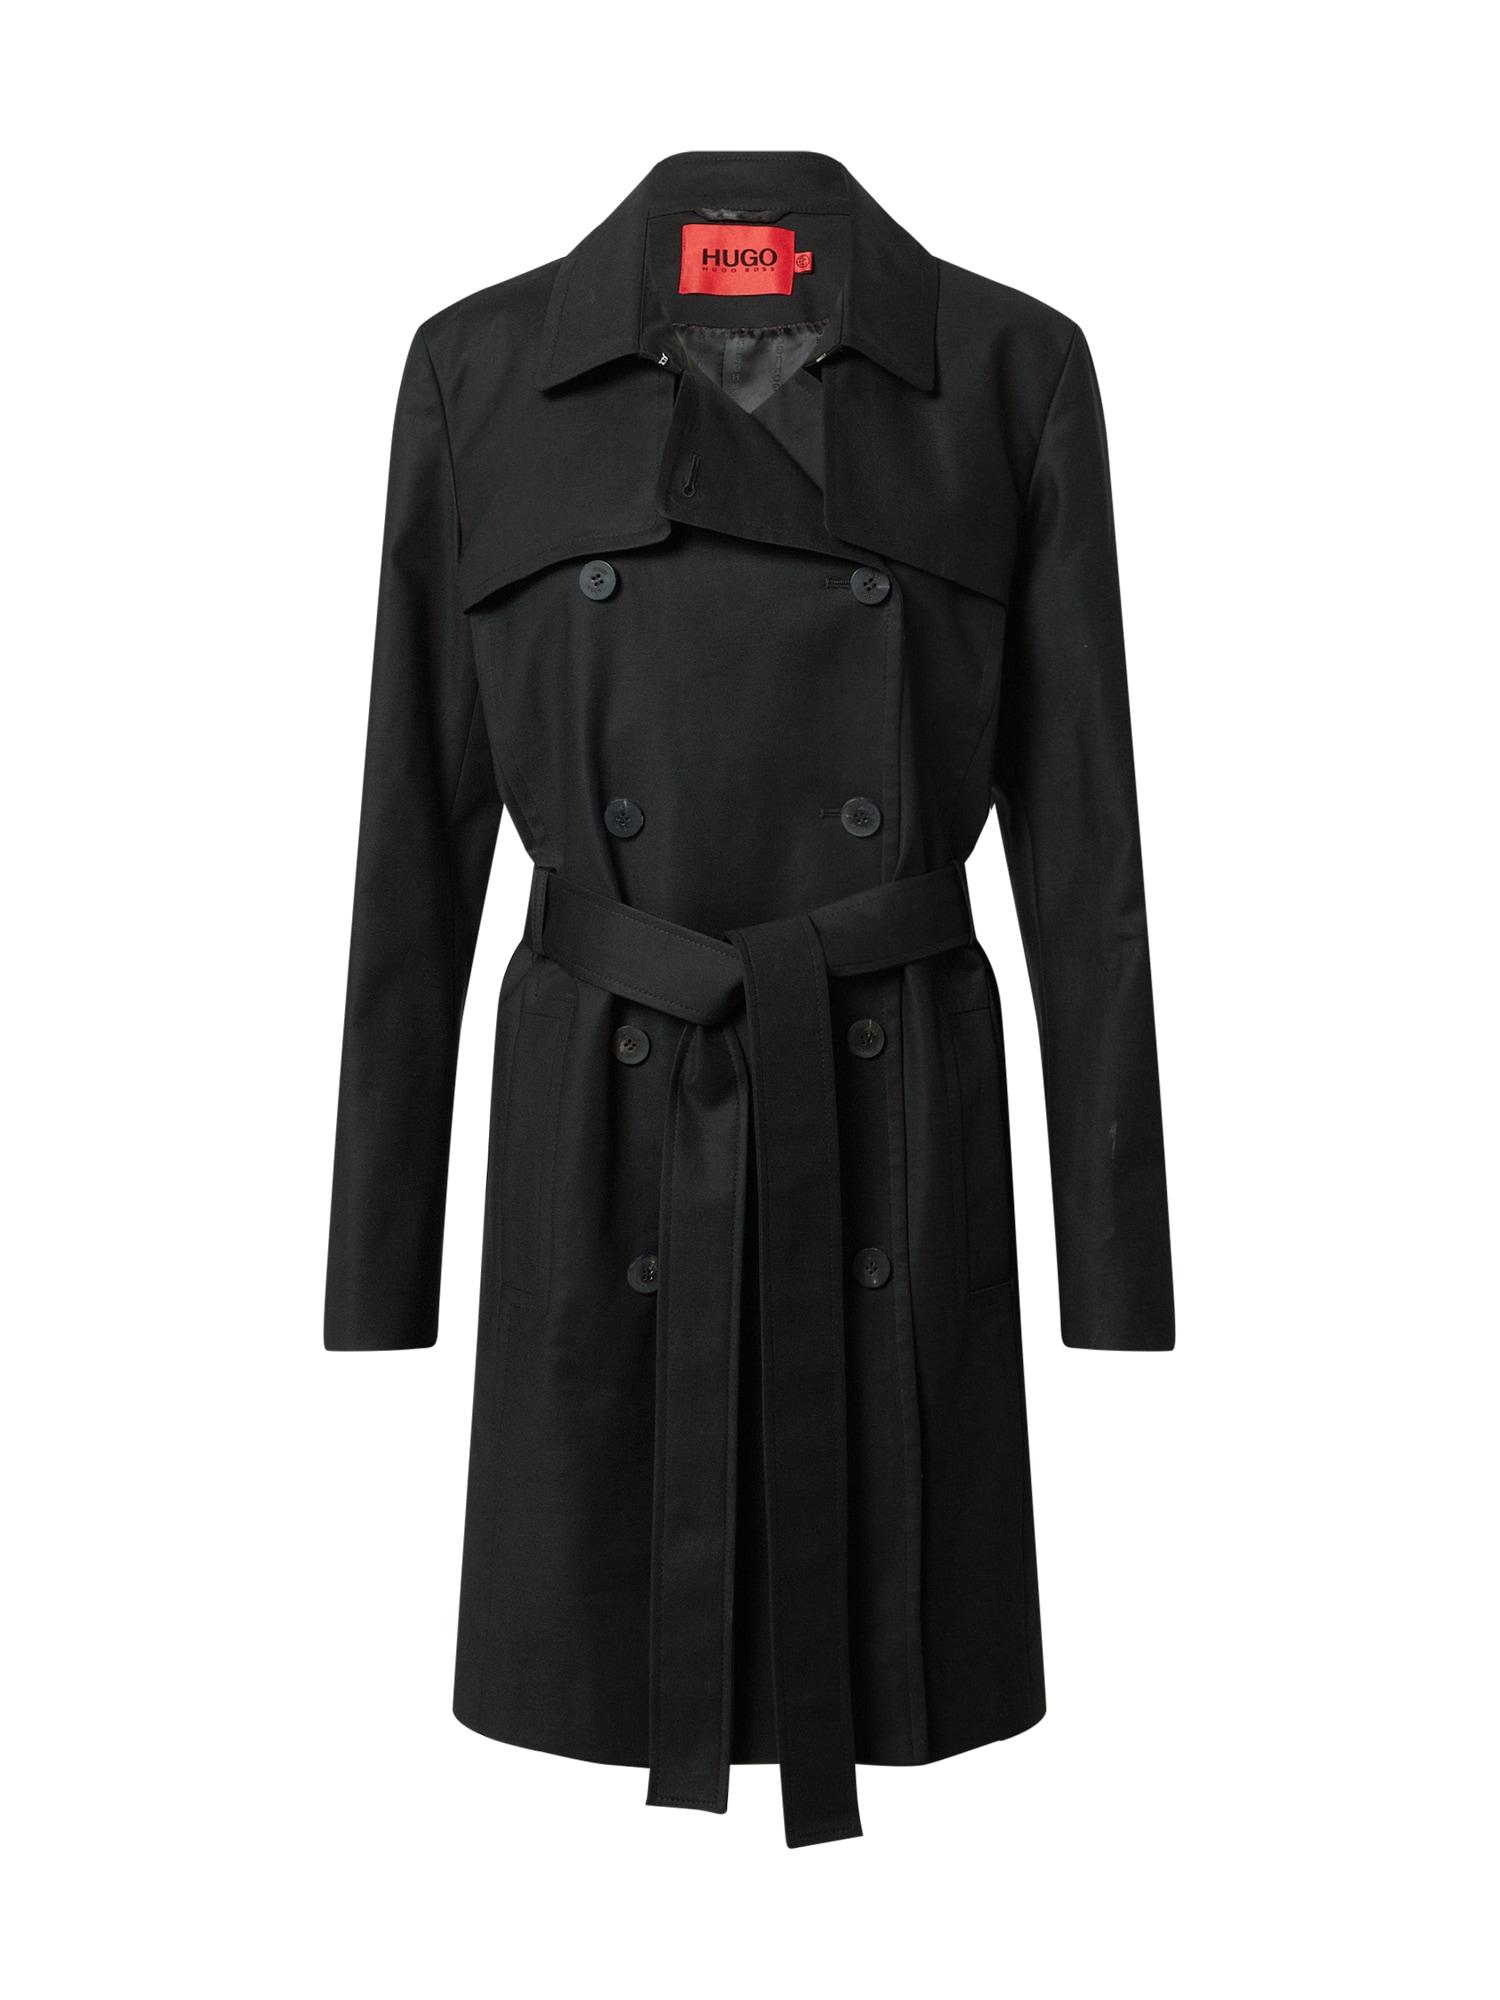 HUGO Demisezoninis paltas 'Makaras-2' juoda